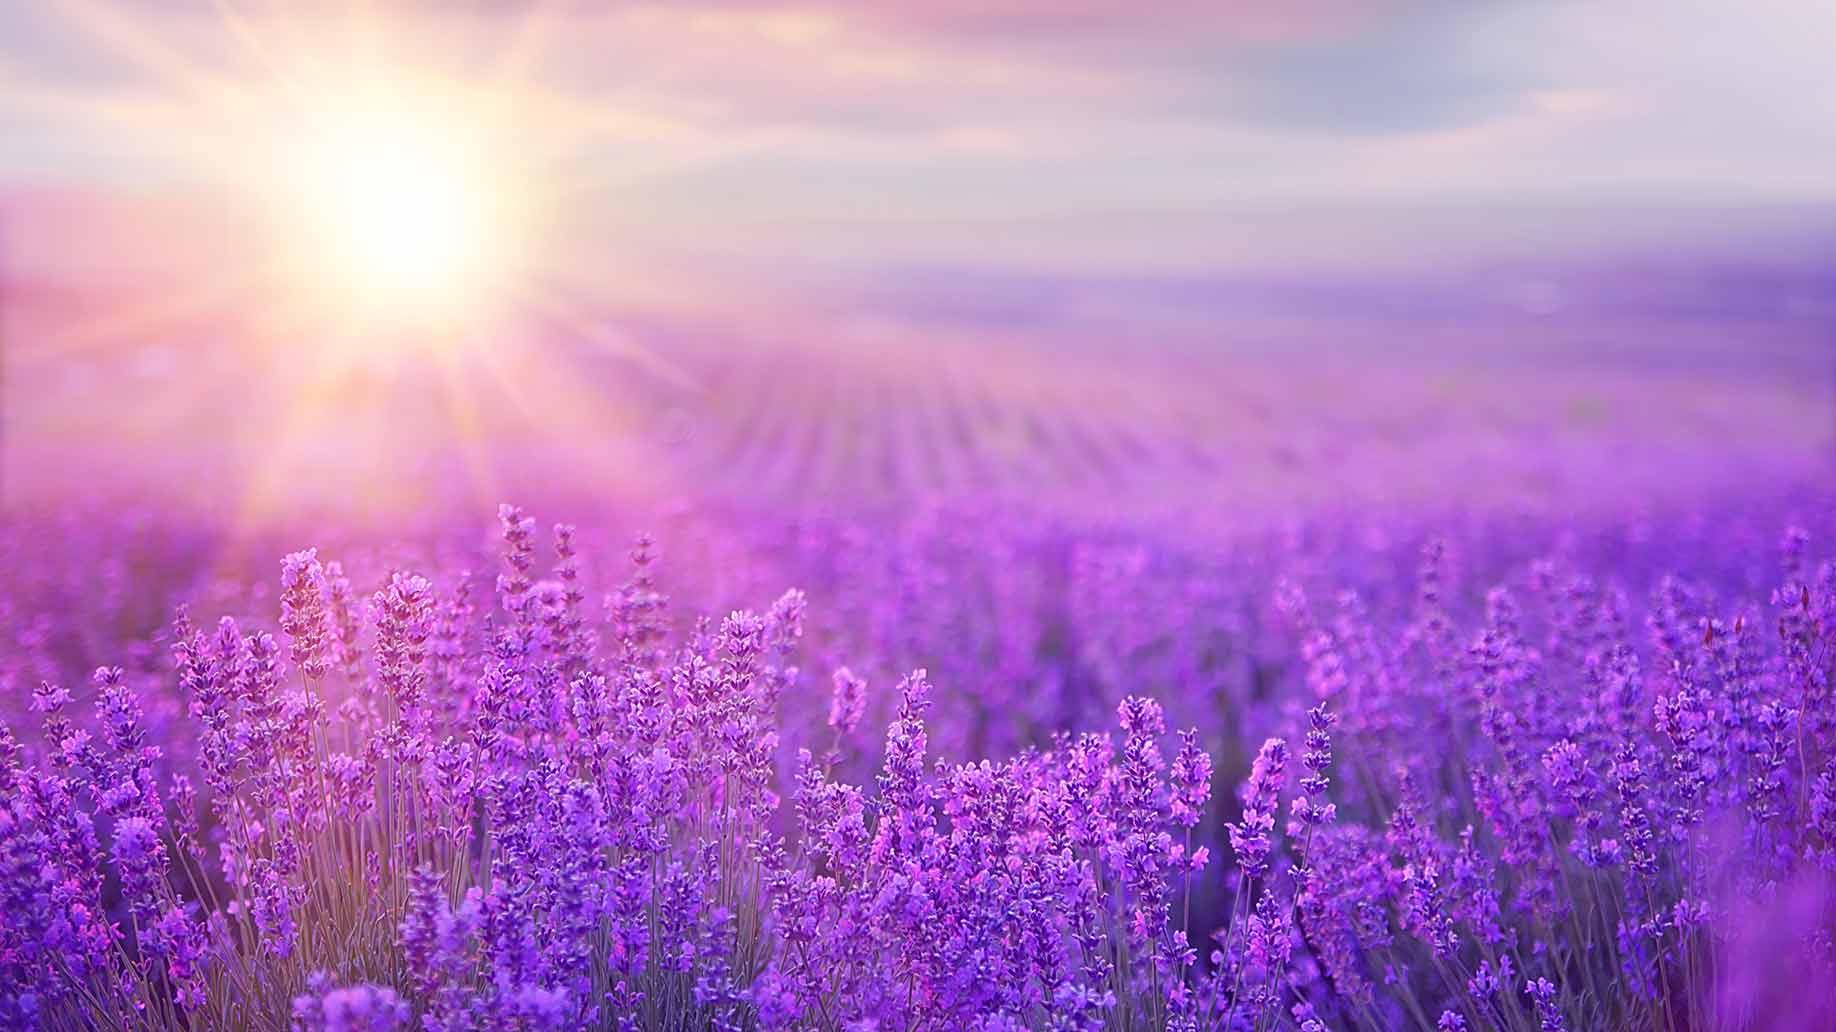 lavender purple flowers field sunshine insomnia sleep disorder natural remedy aid